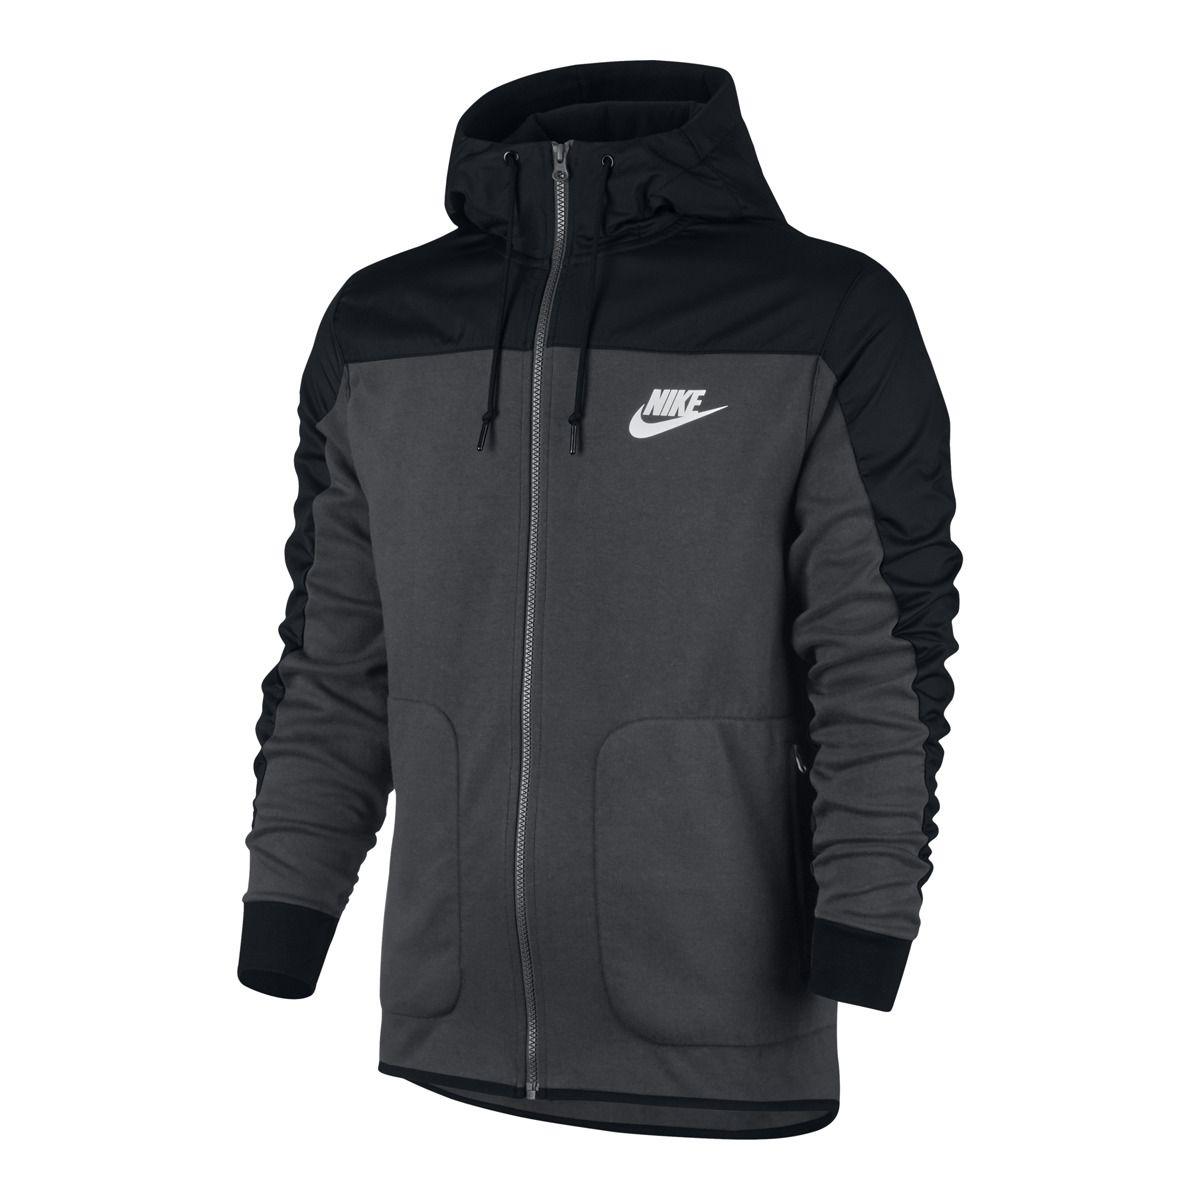 36320ce47 Sudadera de hombre Sportswear Advance 15 Nike